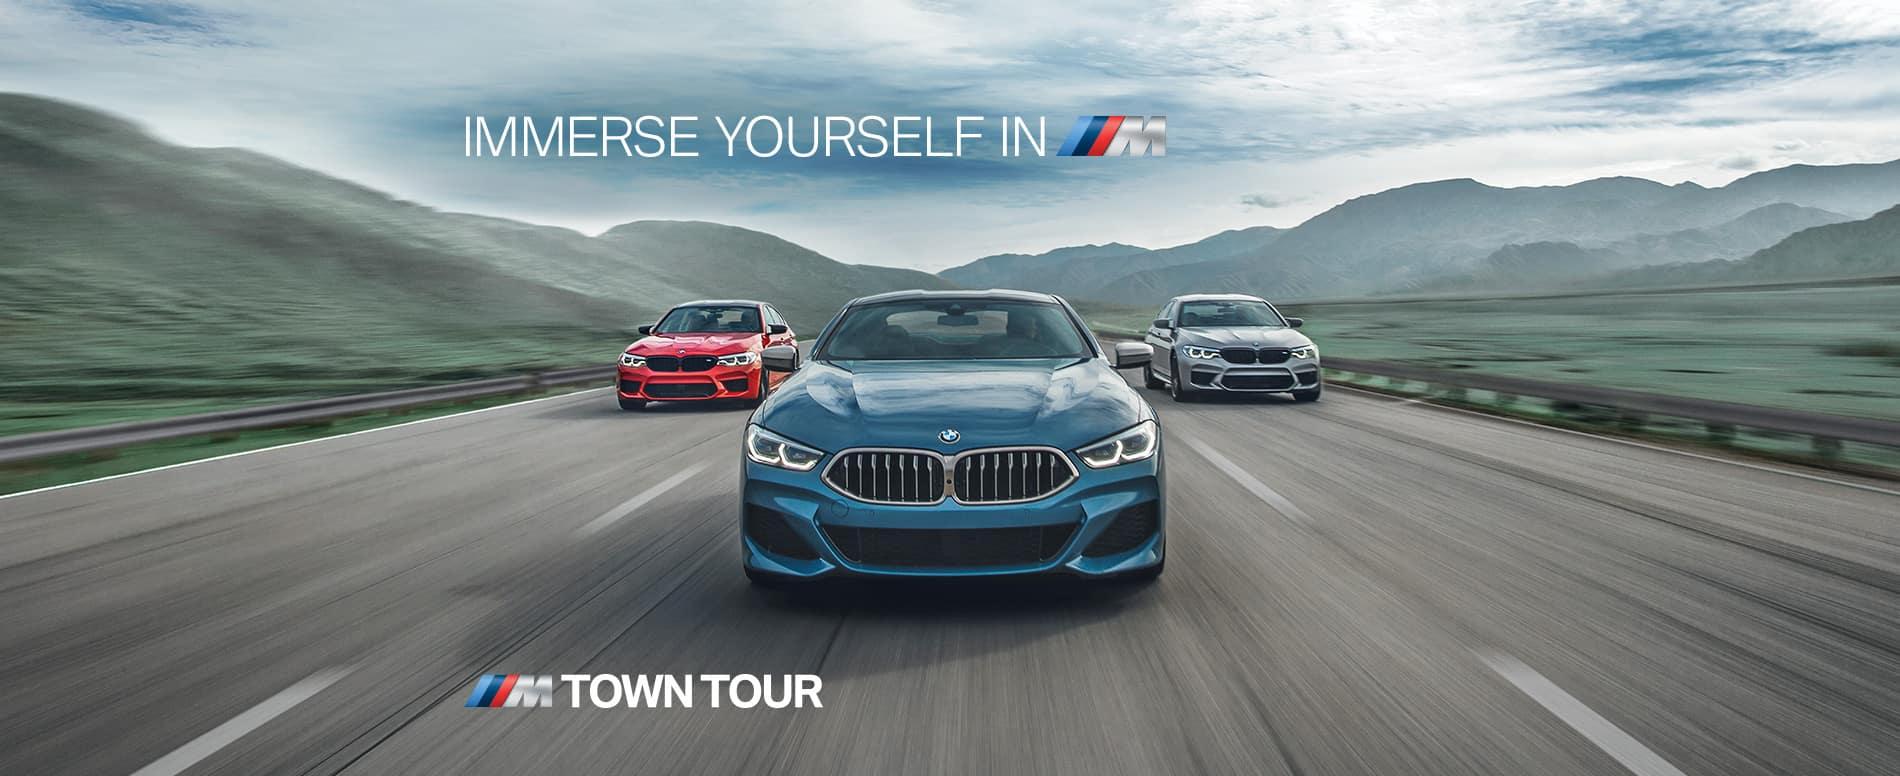 M Town Tour Banner